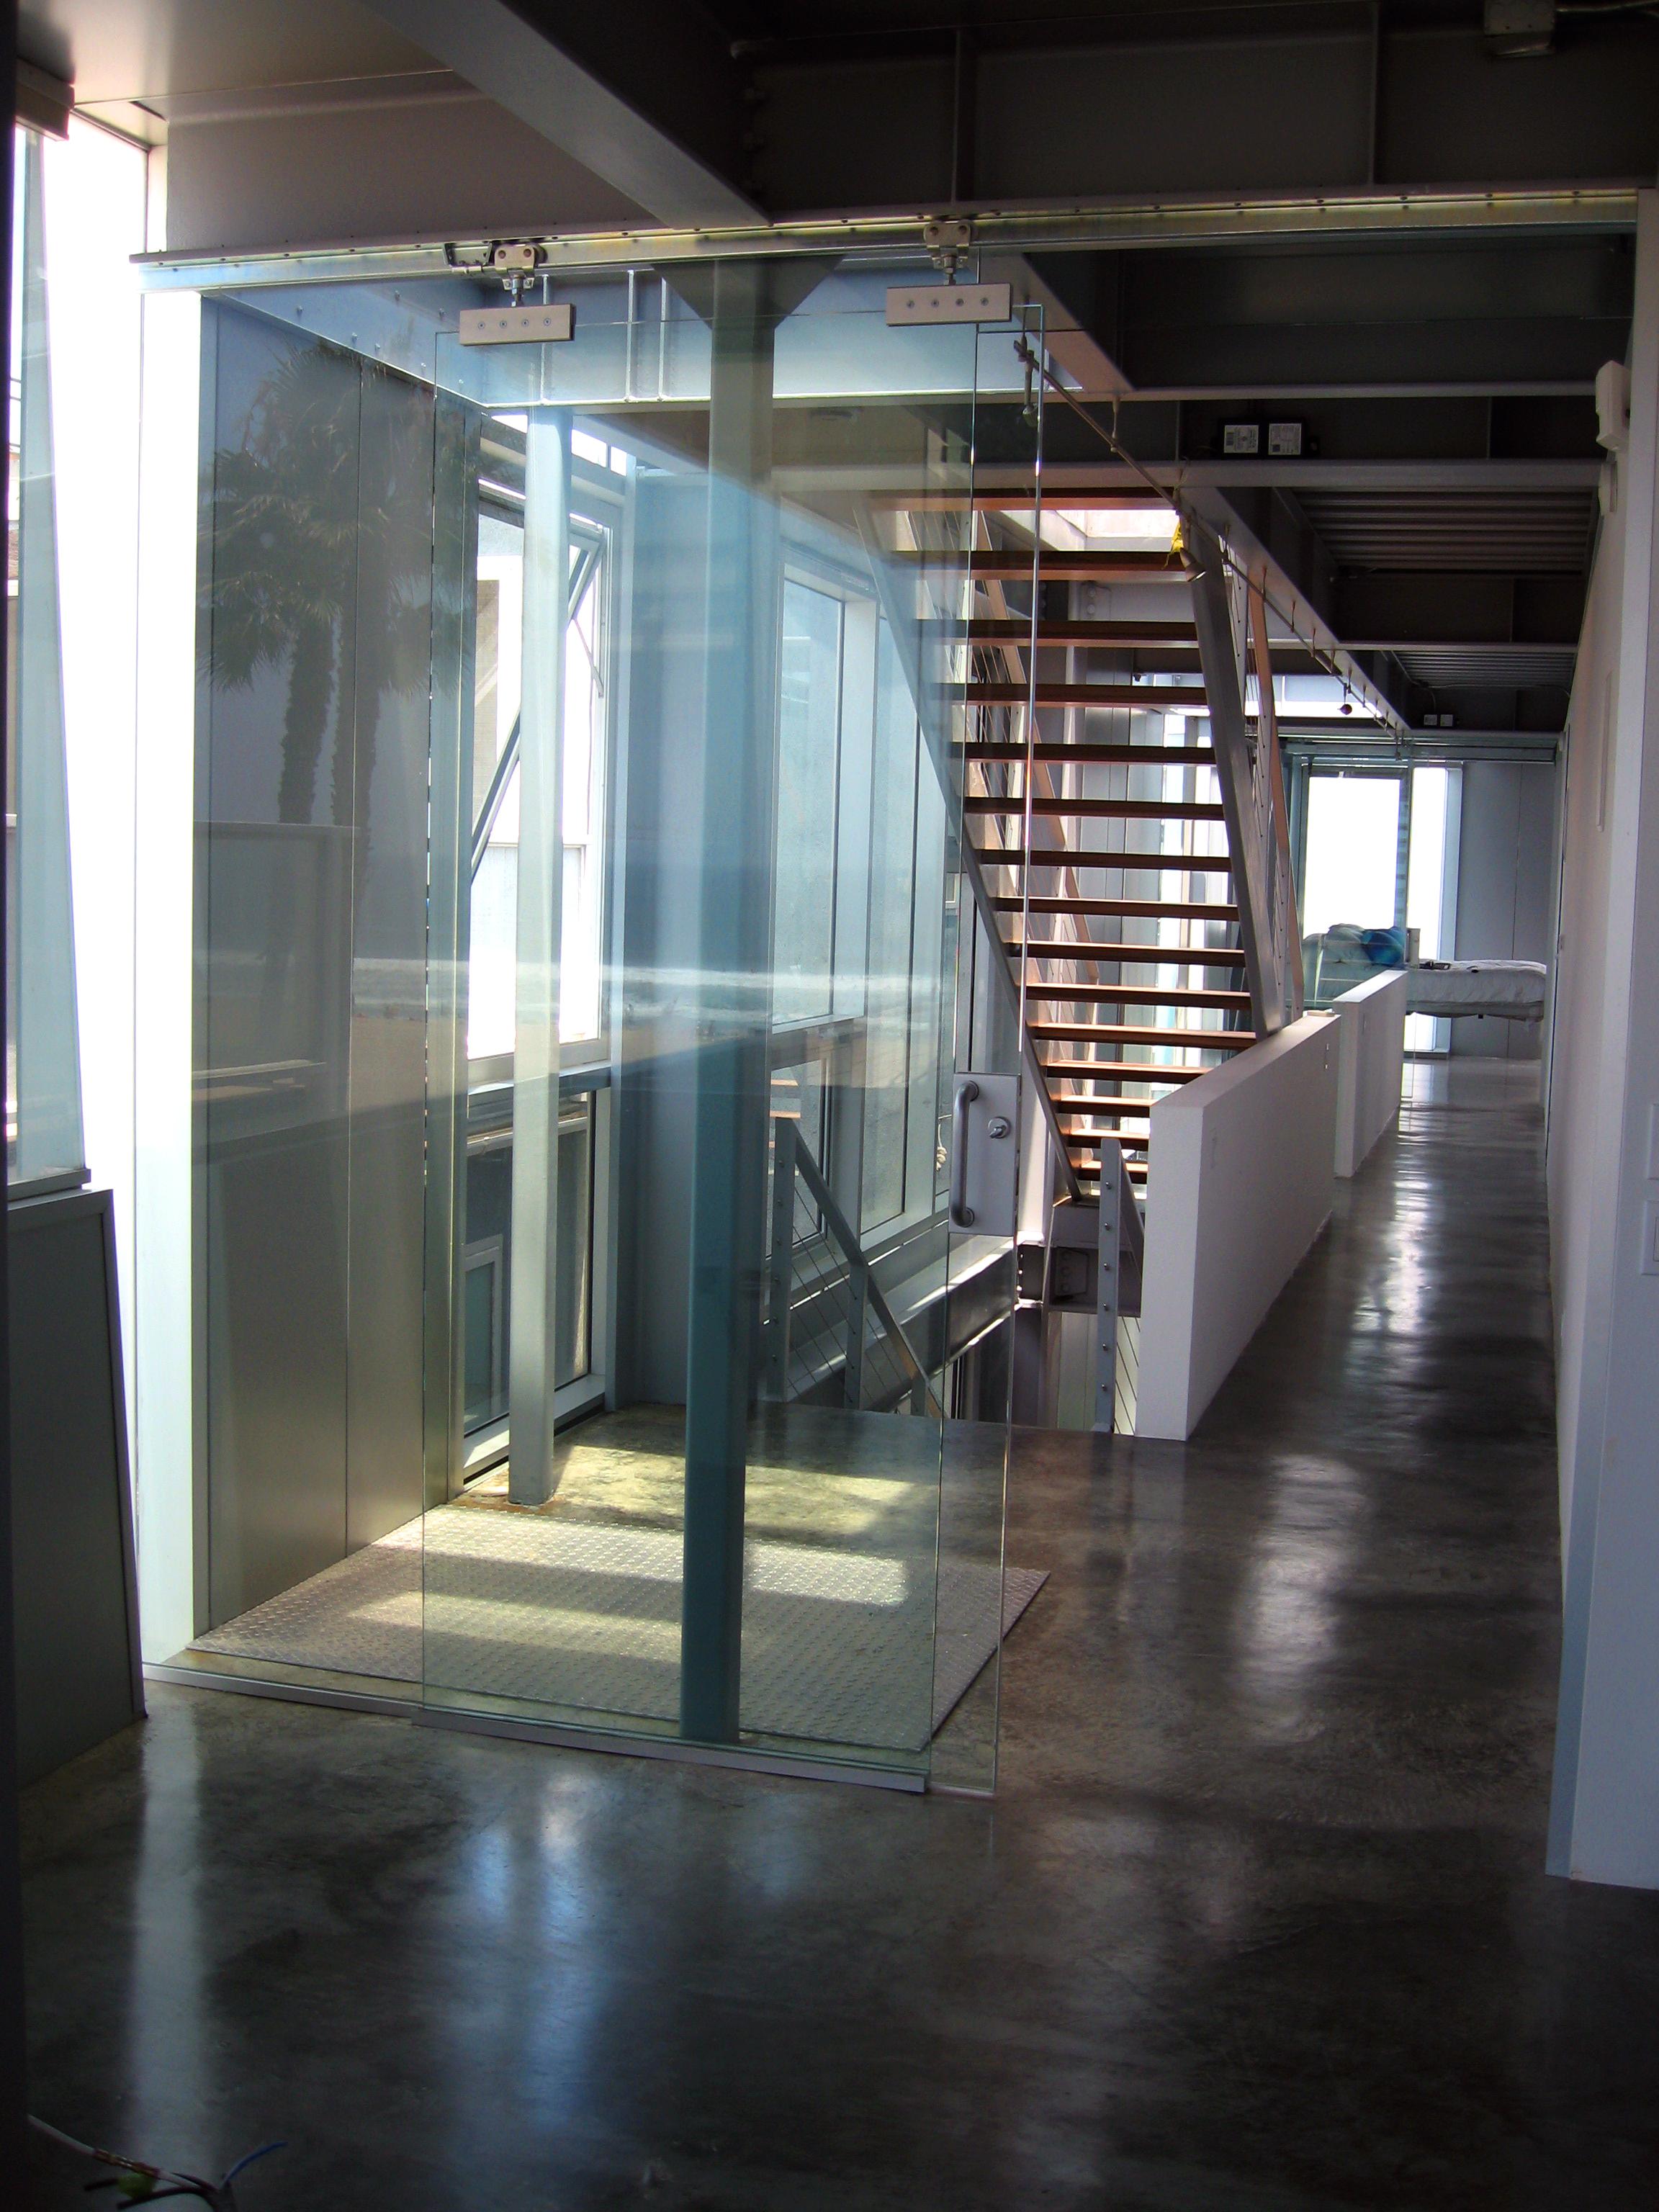 S.E.A.-Studio-Environmental-Architecture-David-Hertz-FAIA-Panel-House-Venice-Beach-California-sustainable-regenerative-restorative-green-design-prefabricated-aluminum-refrigeration-open-concept-ocean-view-residential-glass-steel-sunset-interior-10.jpg